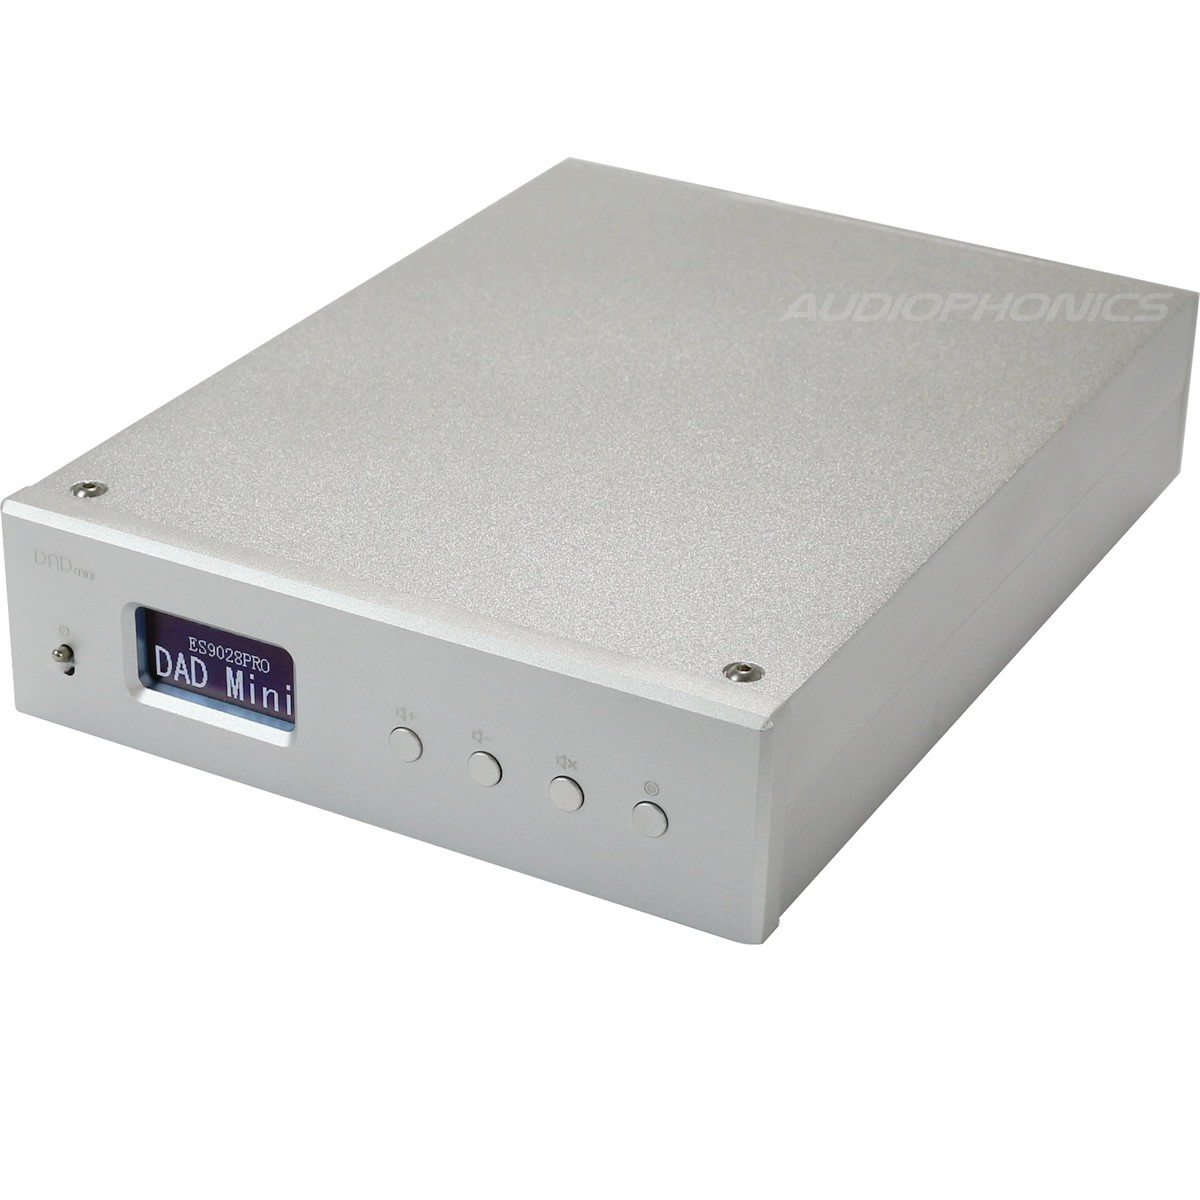 JA DAD MINI USB BALANCED DAC ES9028 PRO XLR 32bit/384kHz DSD 256 XMOS Silver